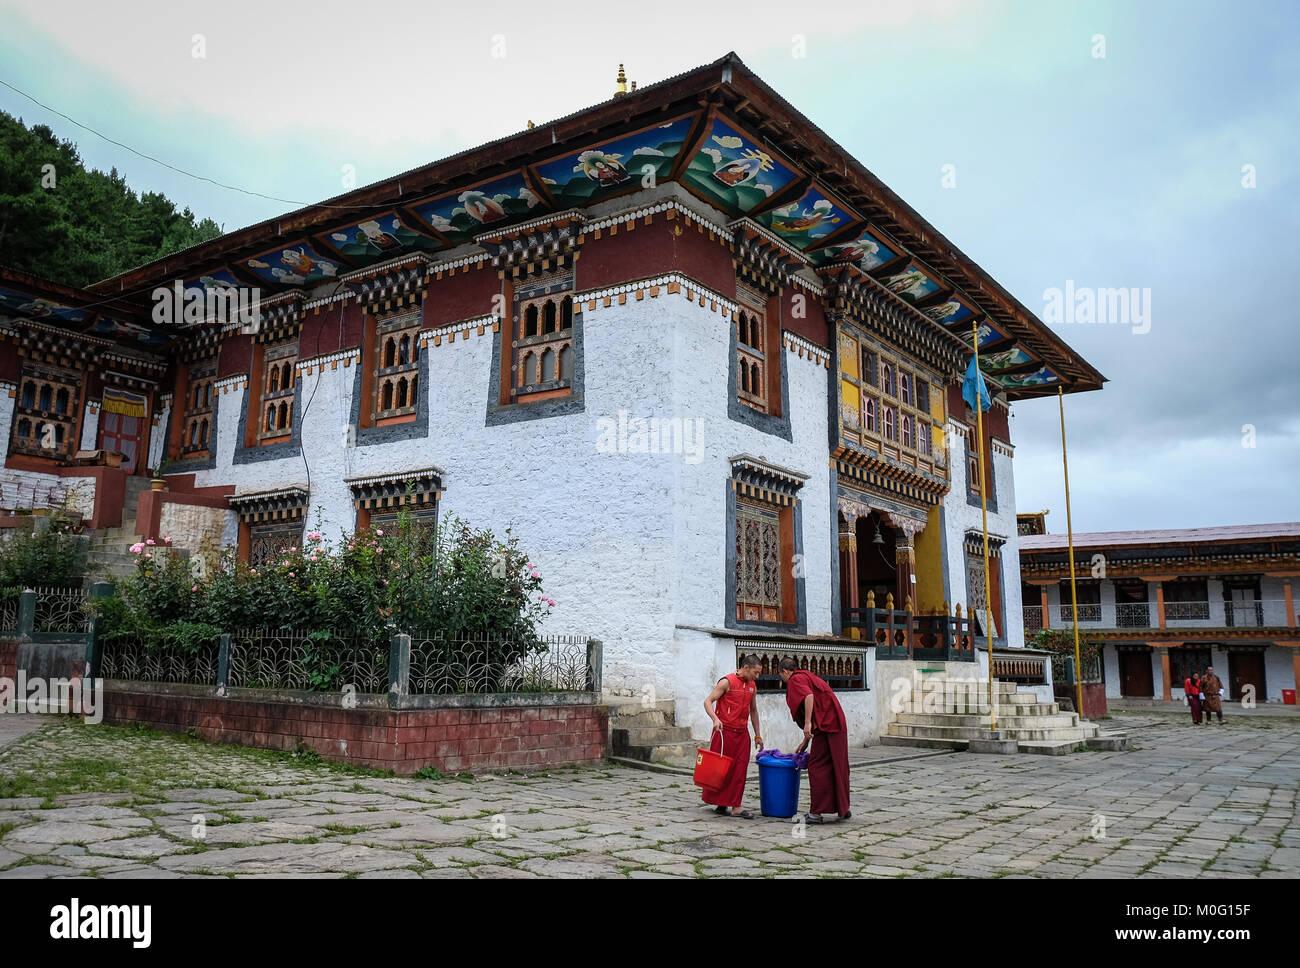 Thimphu, Bhutan - Aug 31, 2015. Monks at ancient Buddhist monastery in Thimphu, Bhutan. Bhutan is a small country - Stock Image